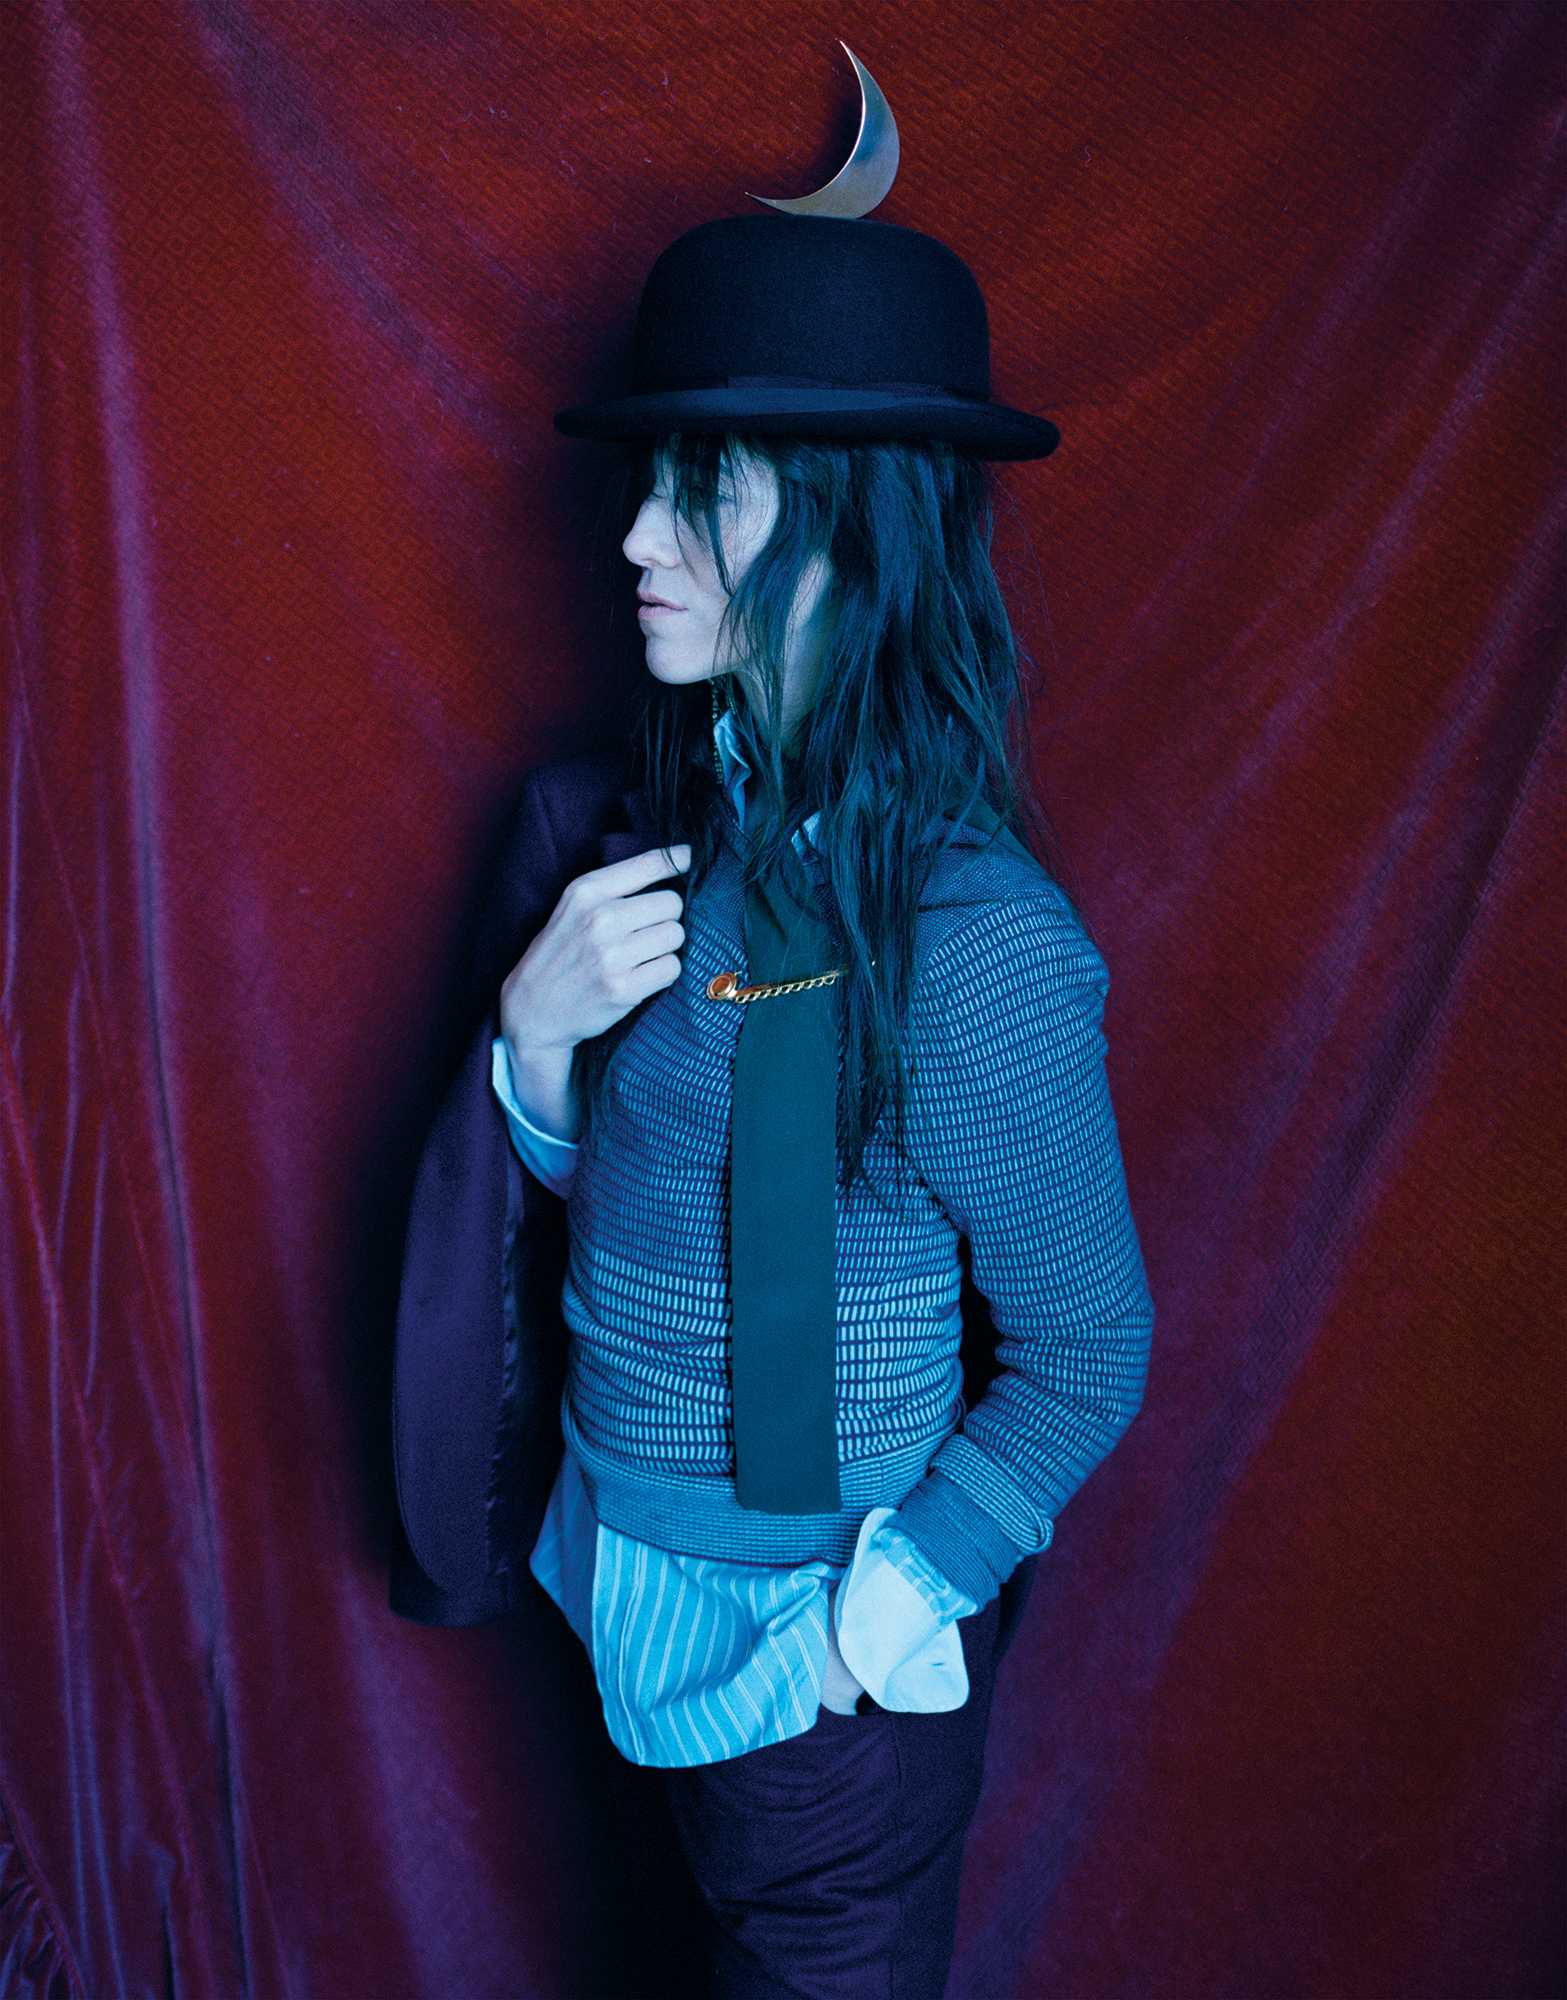 Charlotte Gainsbourg by Tim Walker, W Mag, September 2014